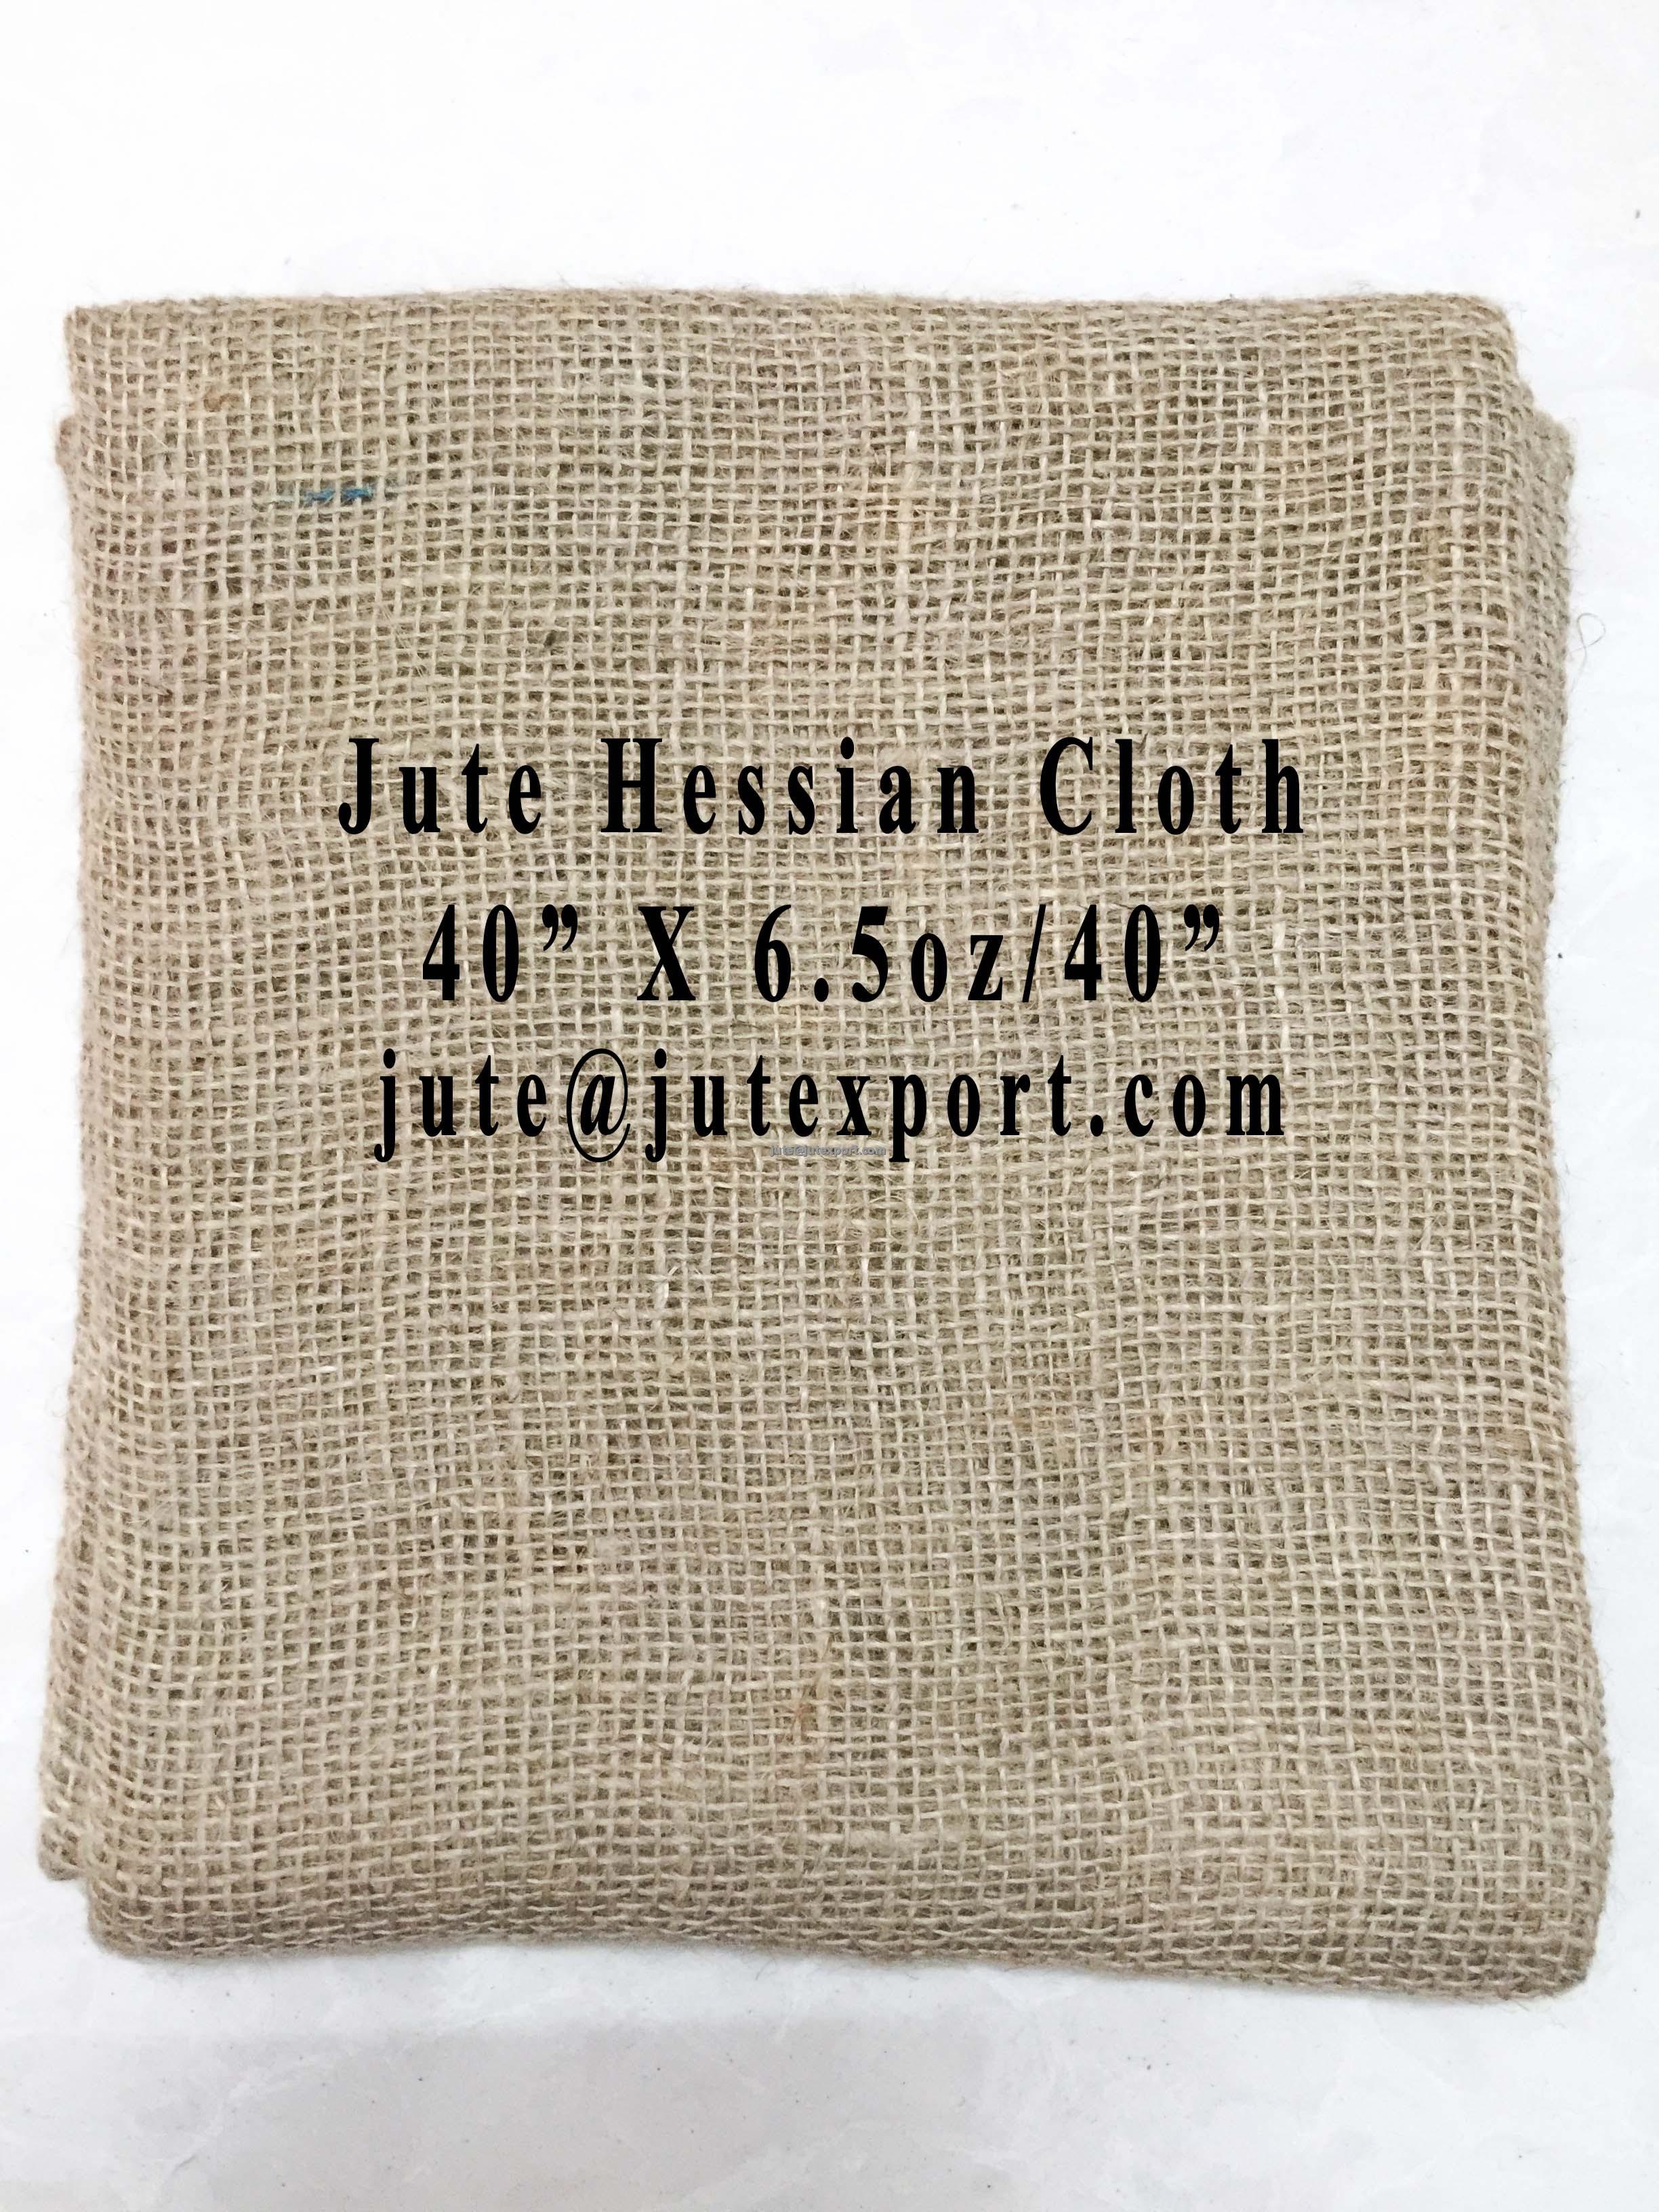 Jute Hessian Cloth 40